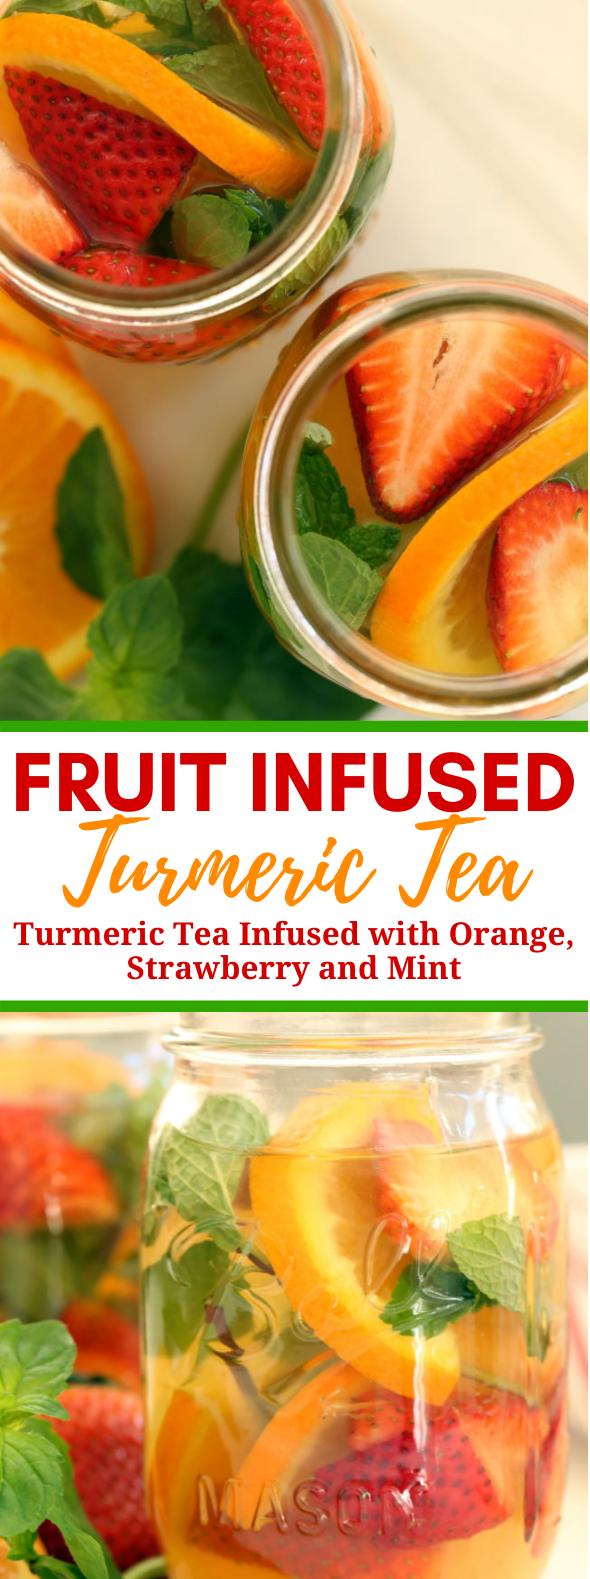 FRUIT INFUSED TURMERIC TEA #detox #healthydrink